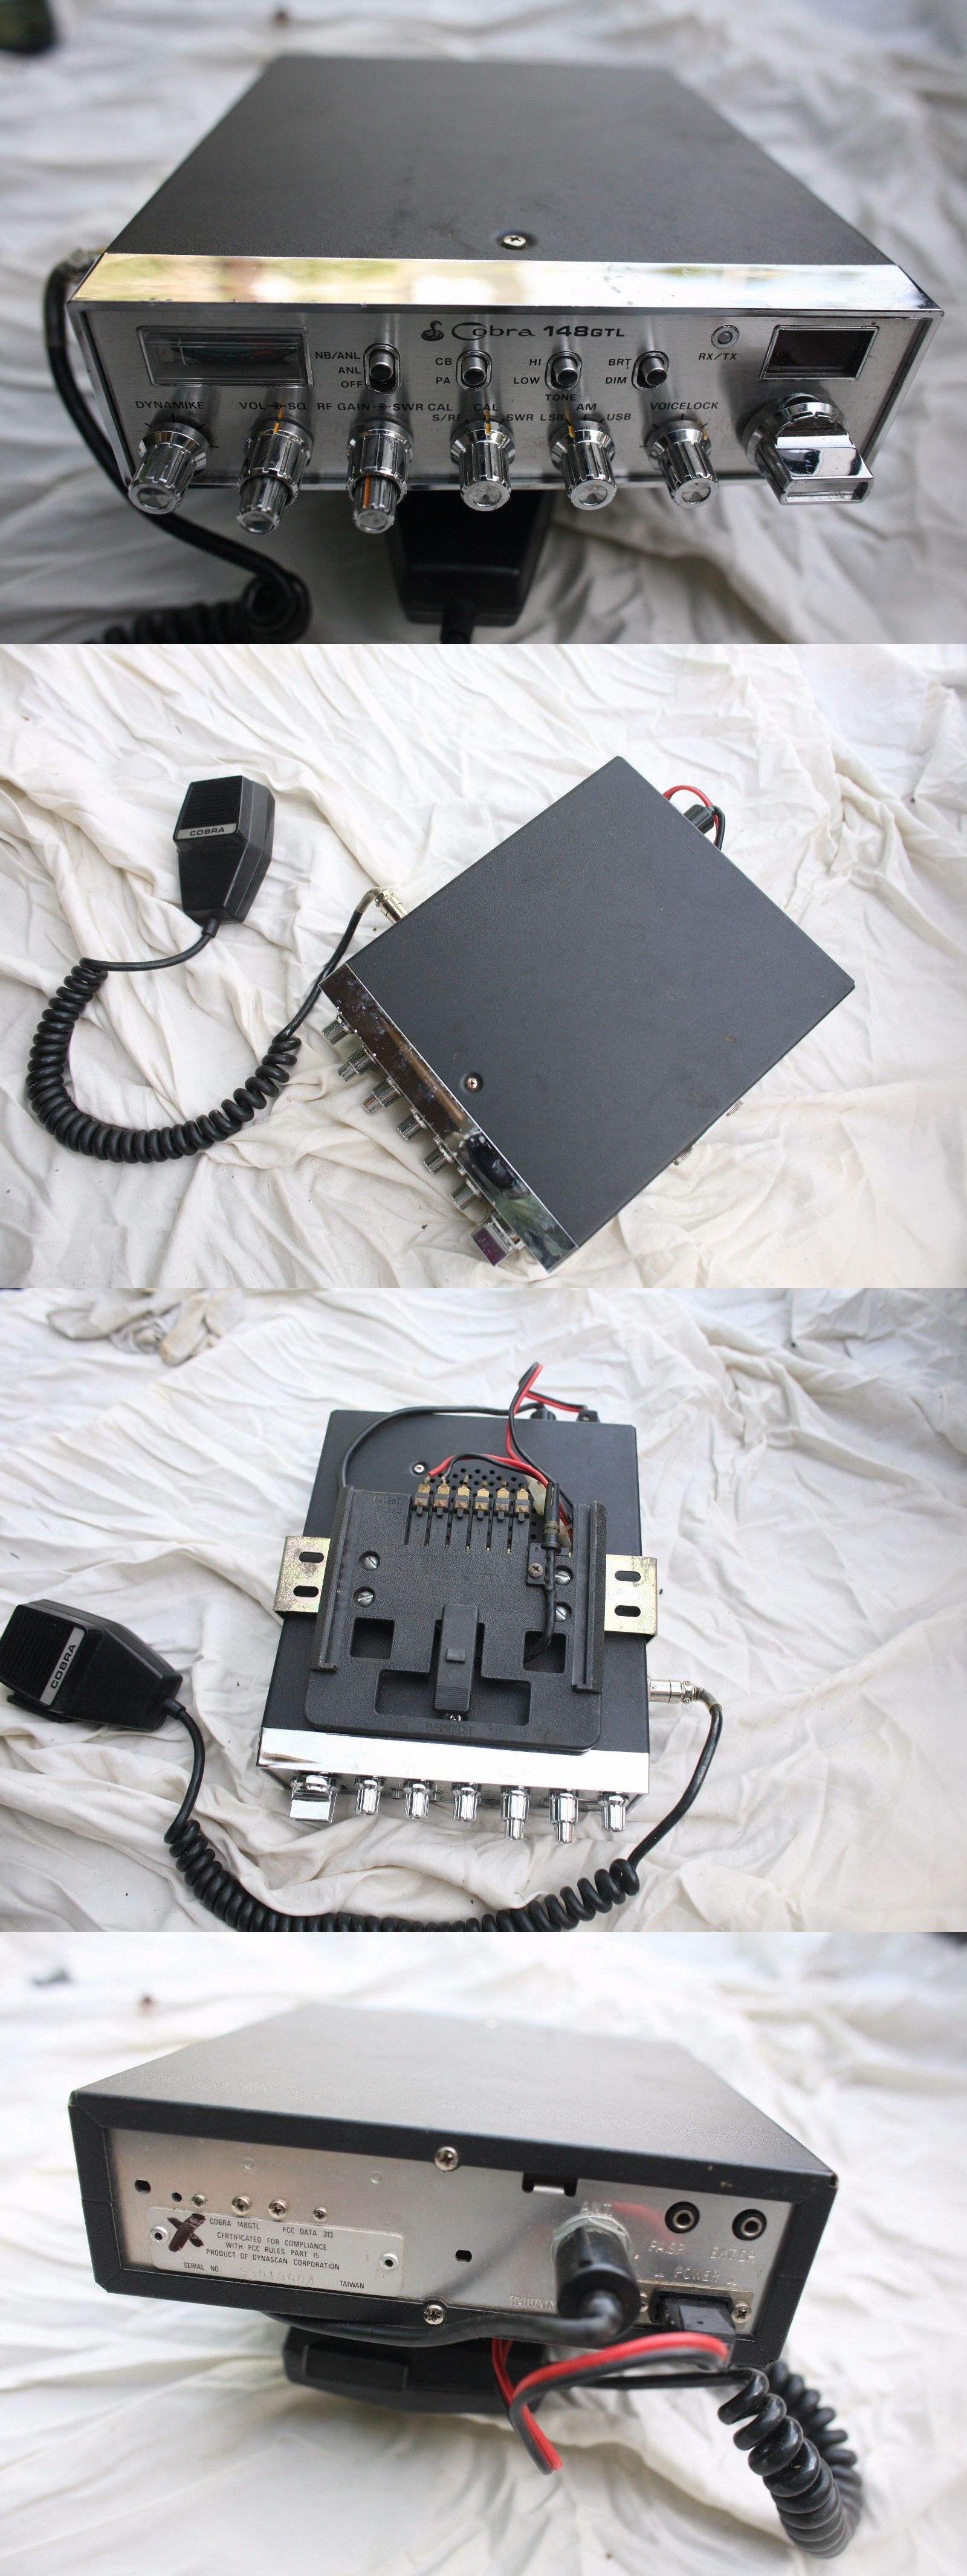 Cb radios never used cobra 148 gtl taiwan model cb radio am ssb cb radios never used cobra 148 gtl taiwan model cb radio am sciox Gallery